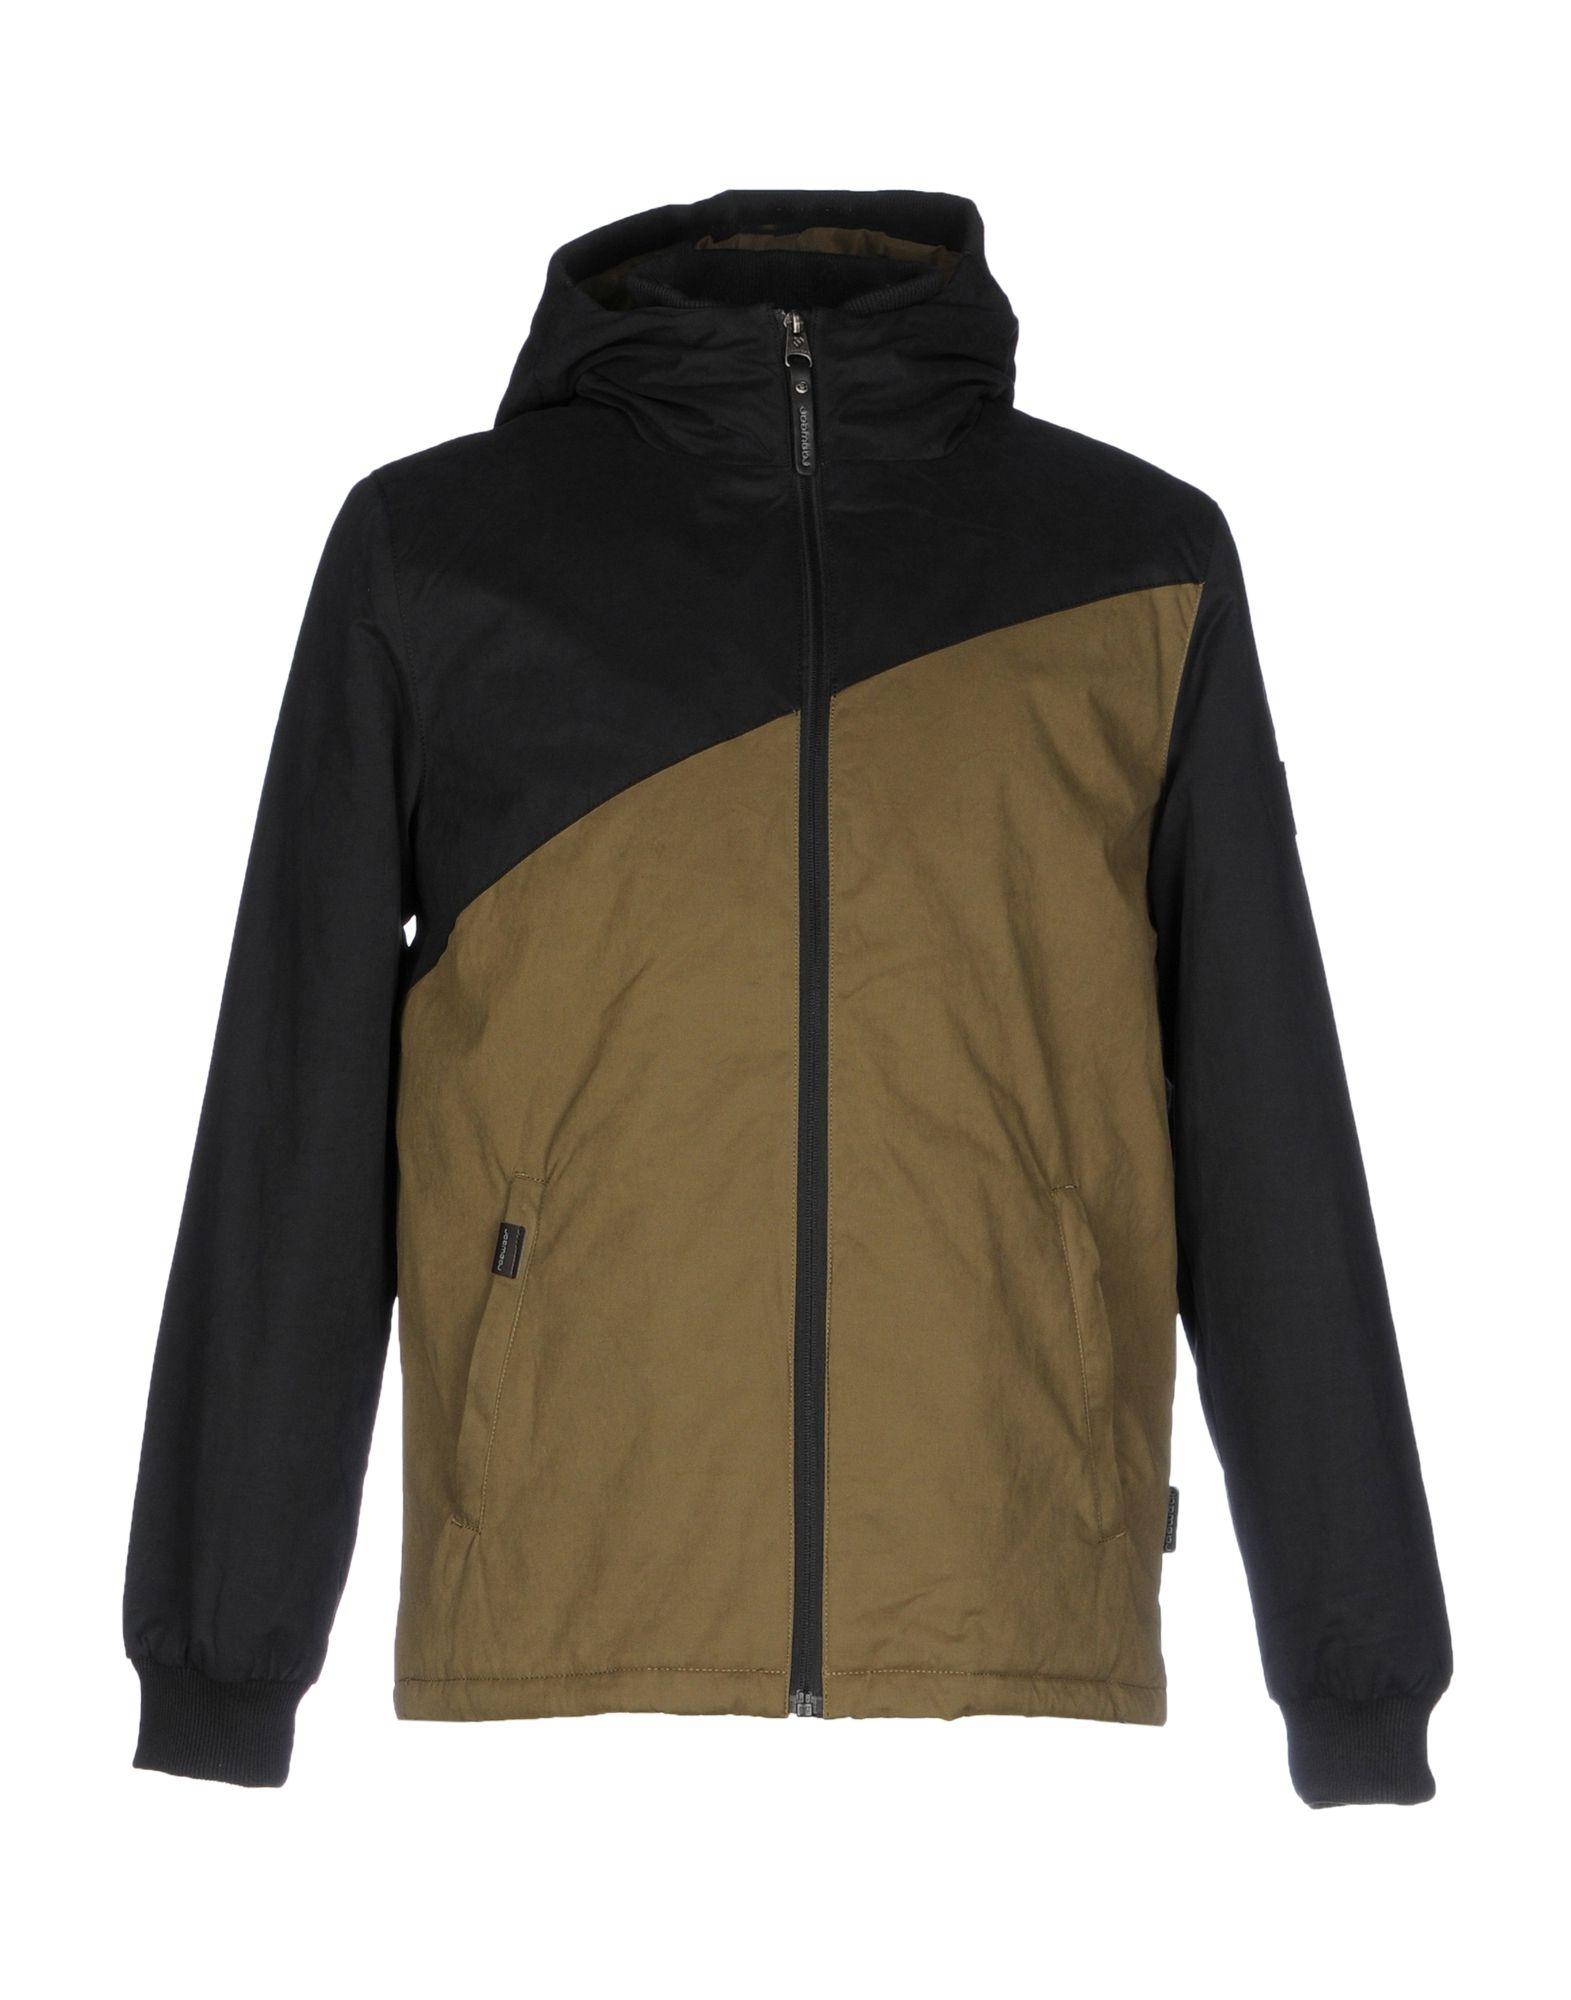 RAGWEAR Herren Jacke Farbe Militärgrün Größe 4